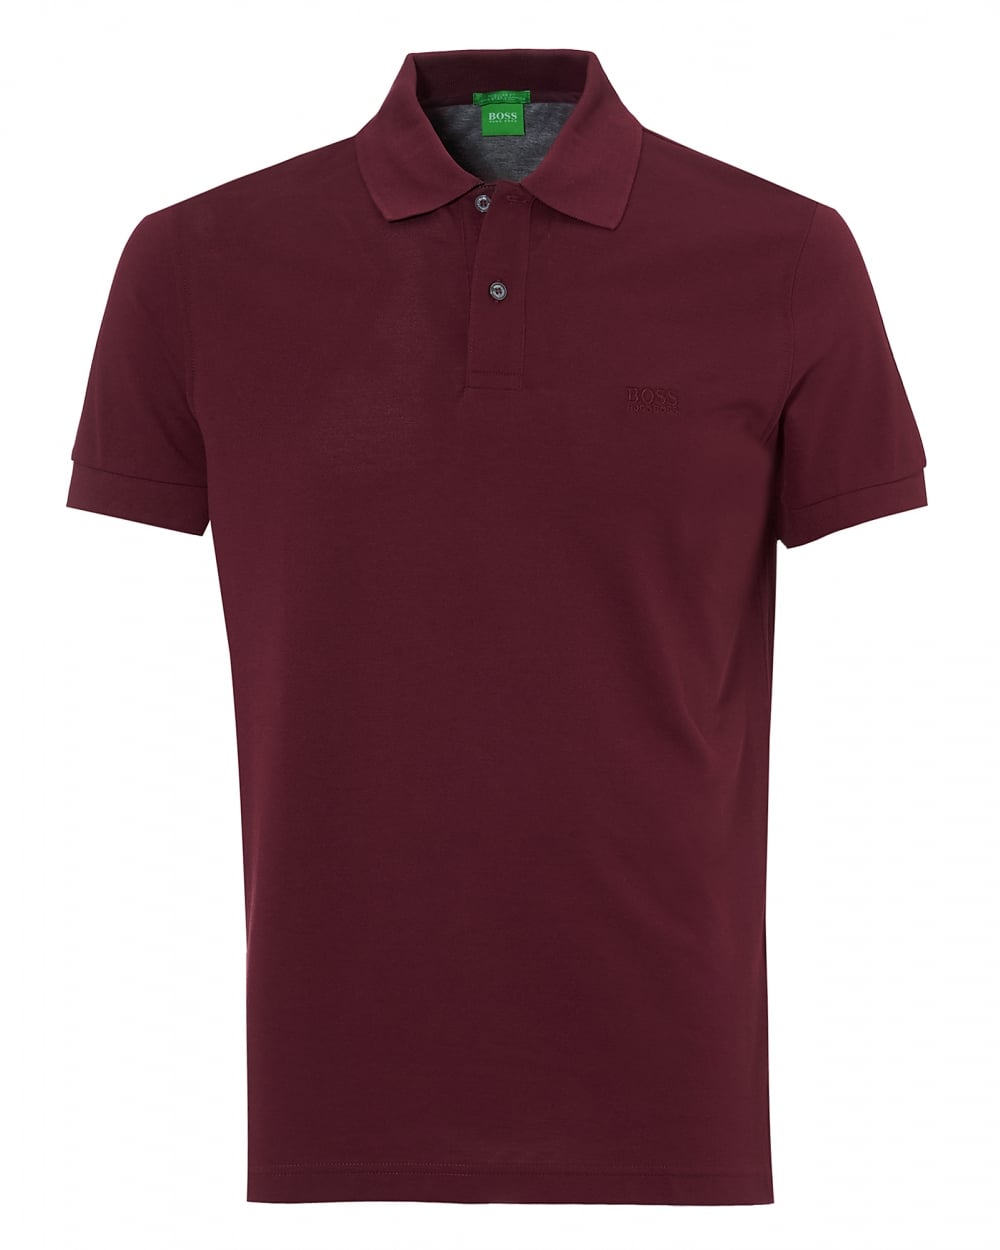 Mens Firenze Polo, Pima Cotton Port Royal Polo Shirt